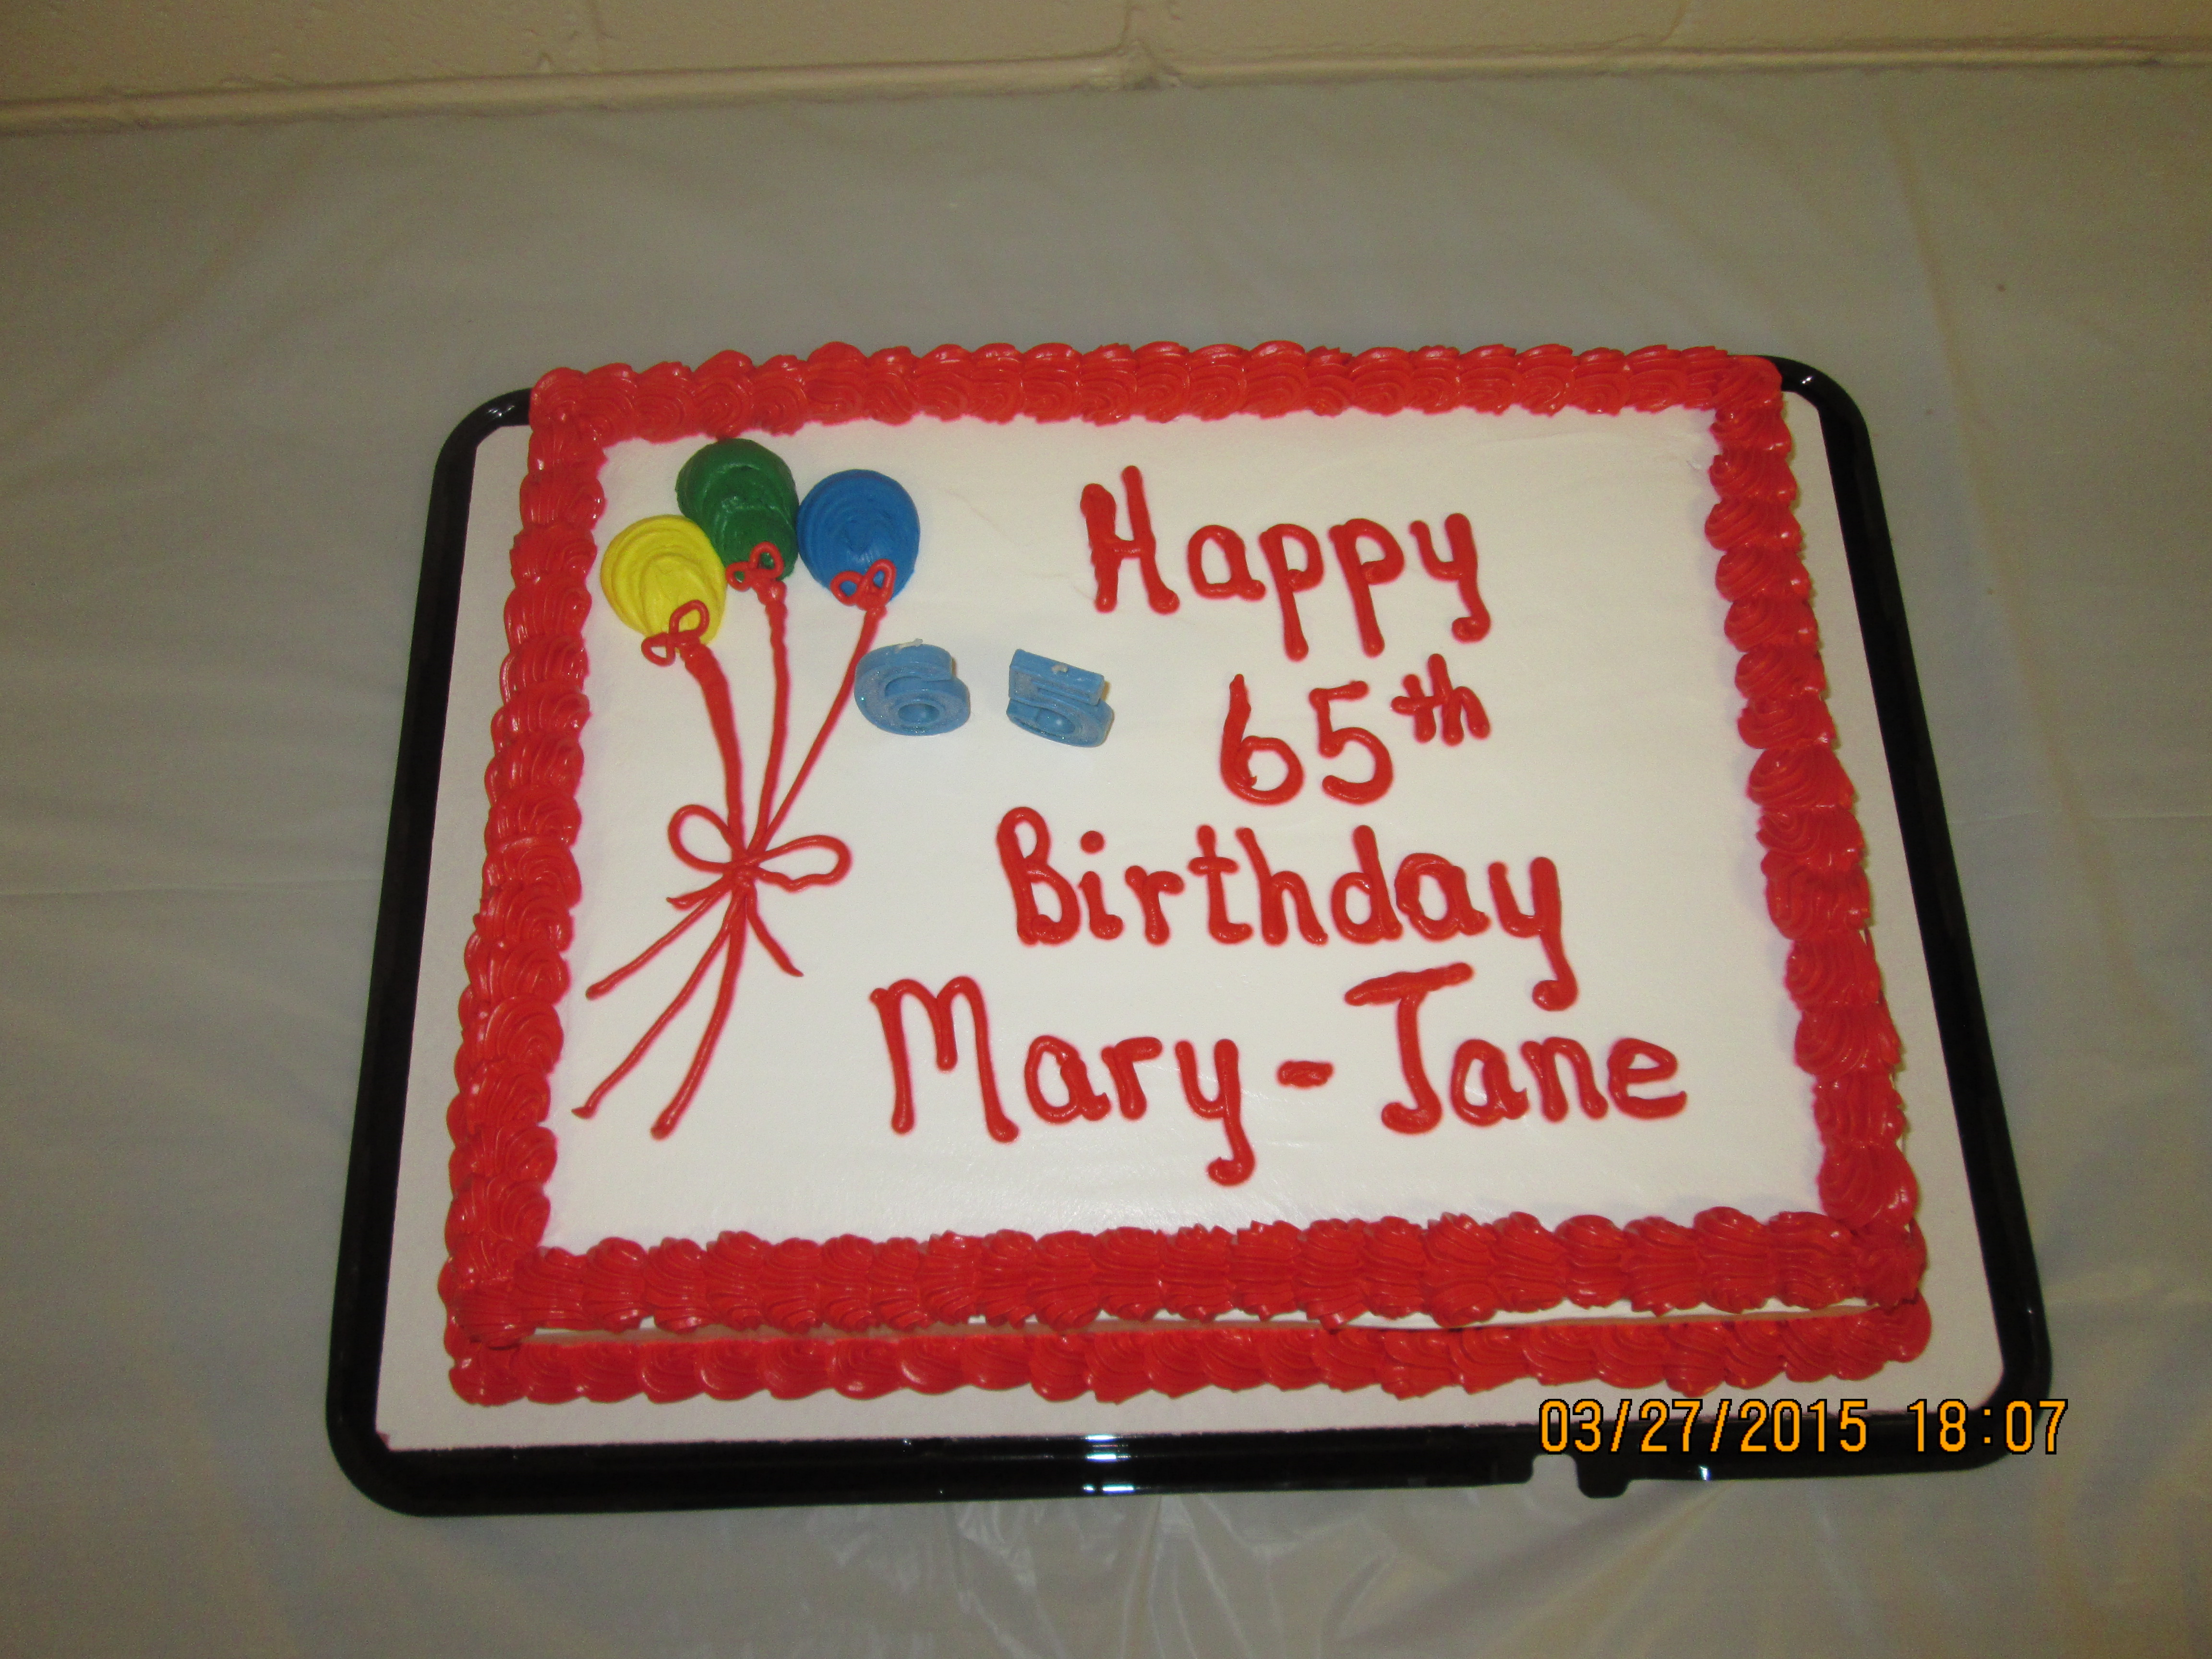 Best Wishes To Mary Jane Goodchild Celebrating Her 65th Birthday On